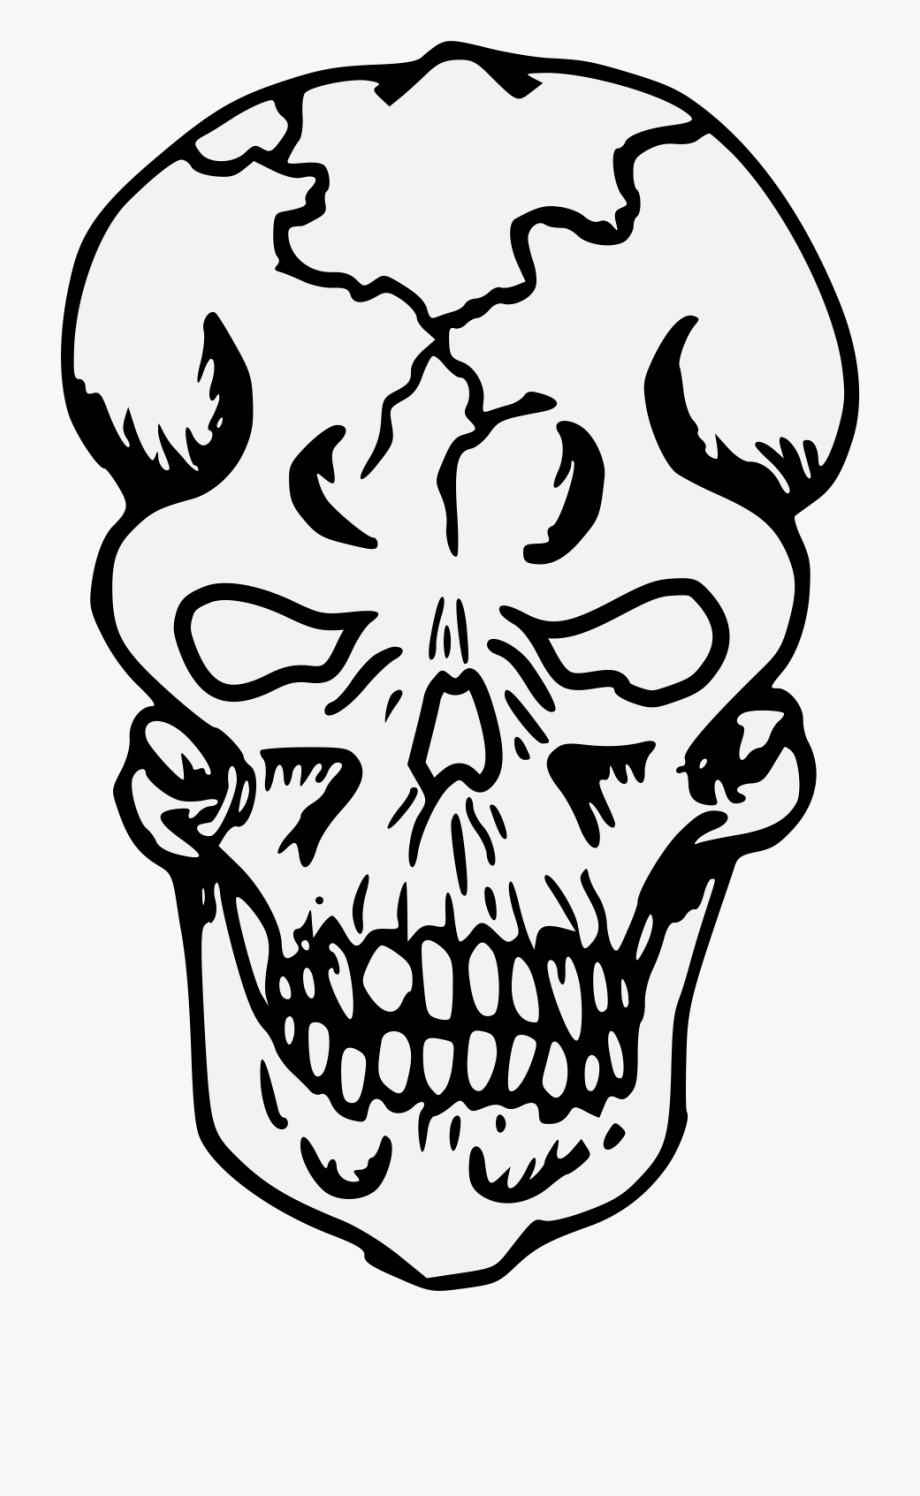 Traceable free . Bones clipart illustration